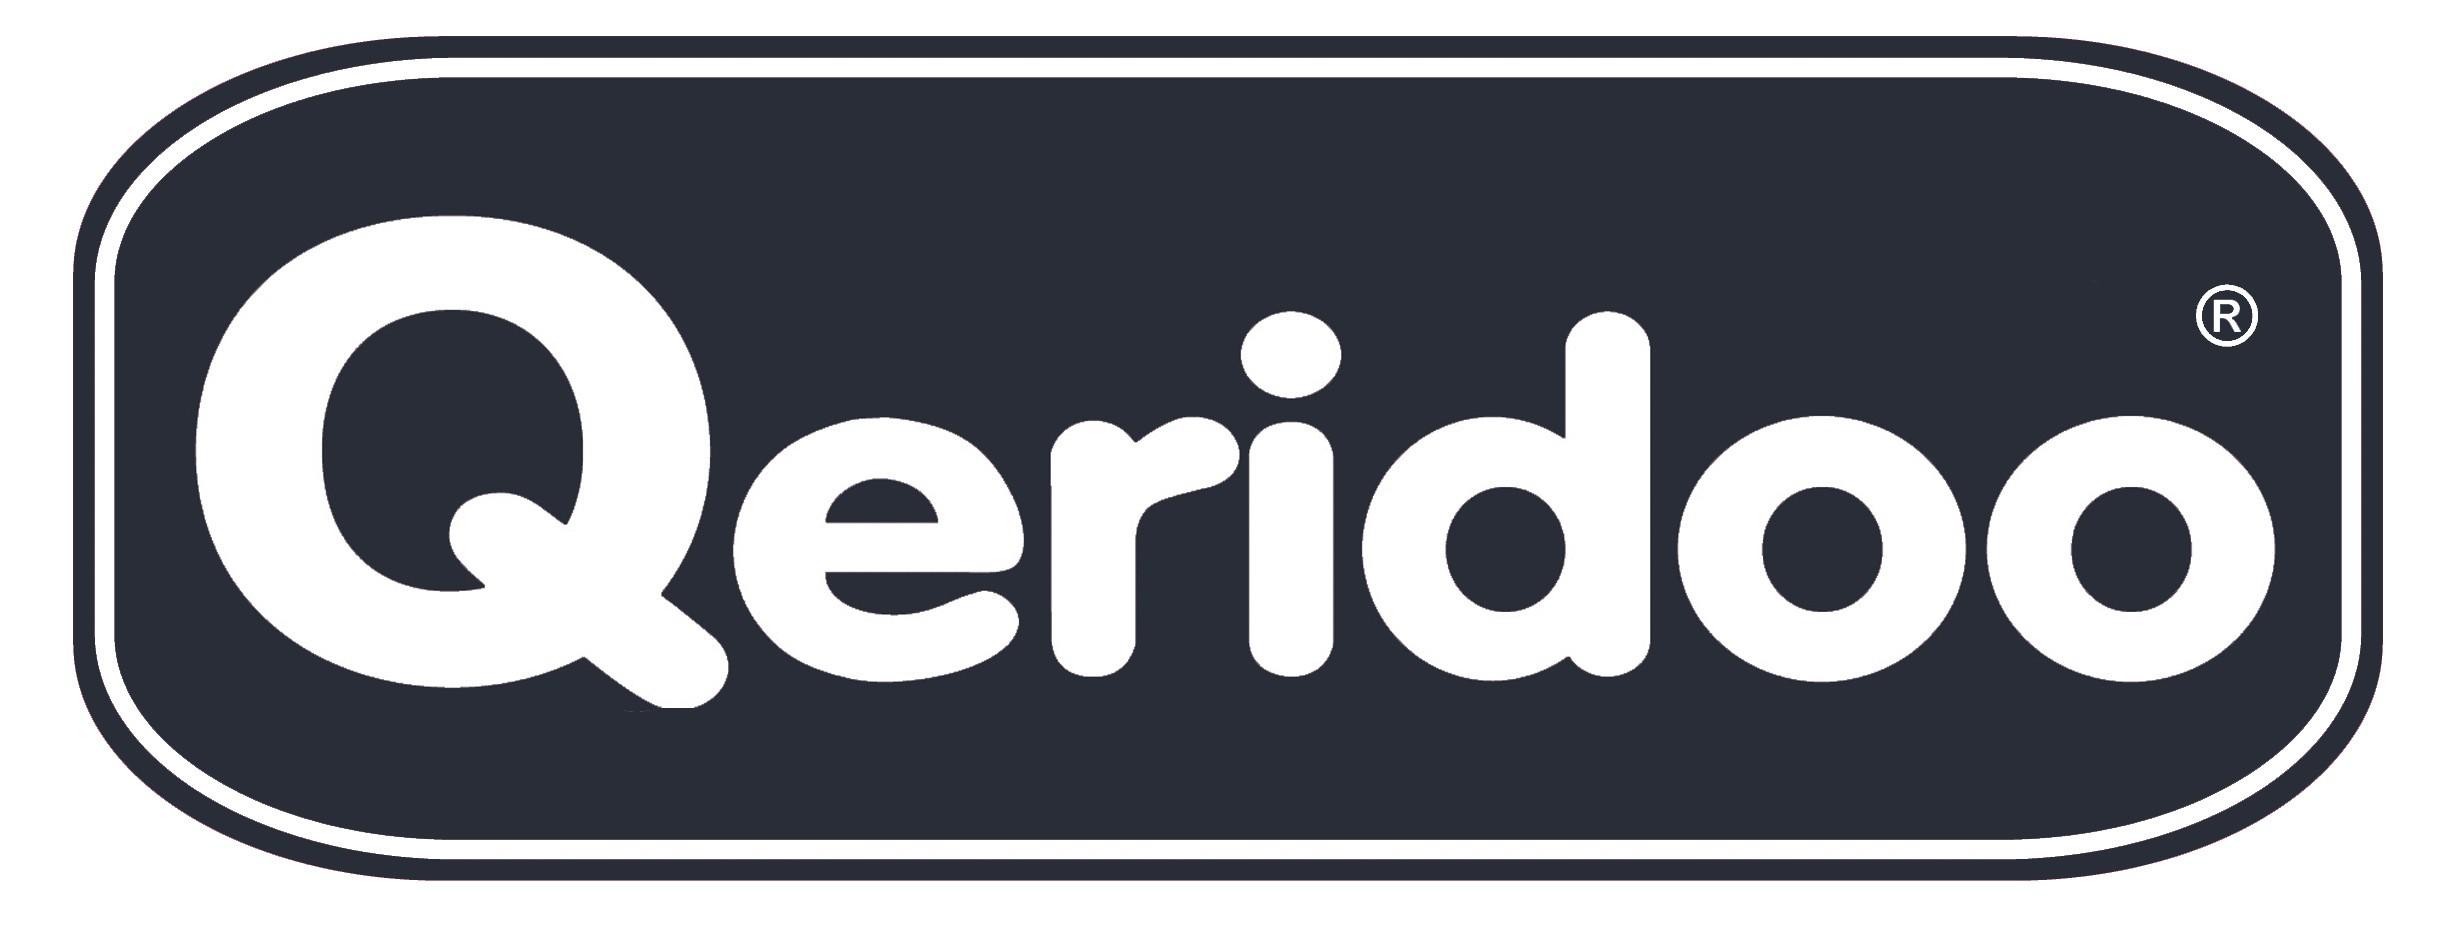 Qeridoo